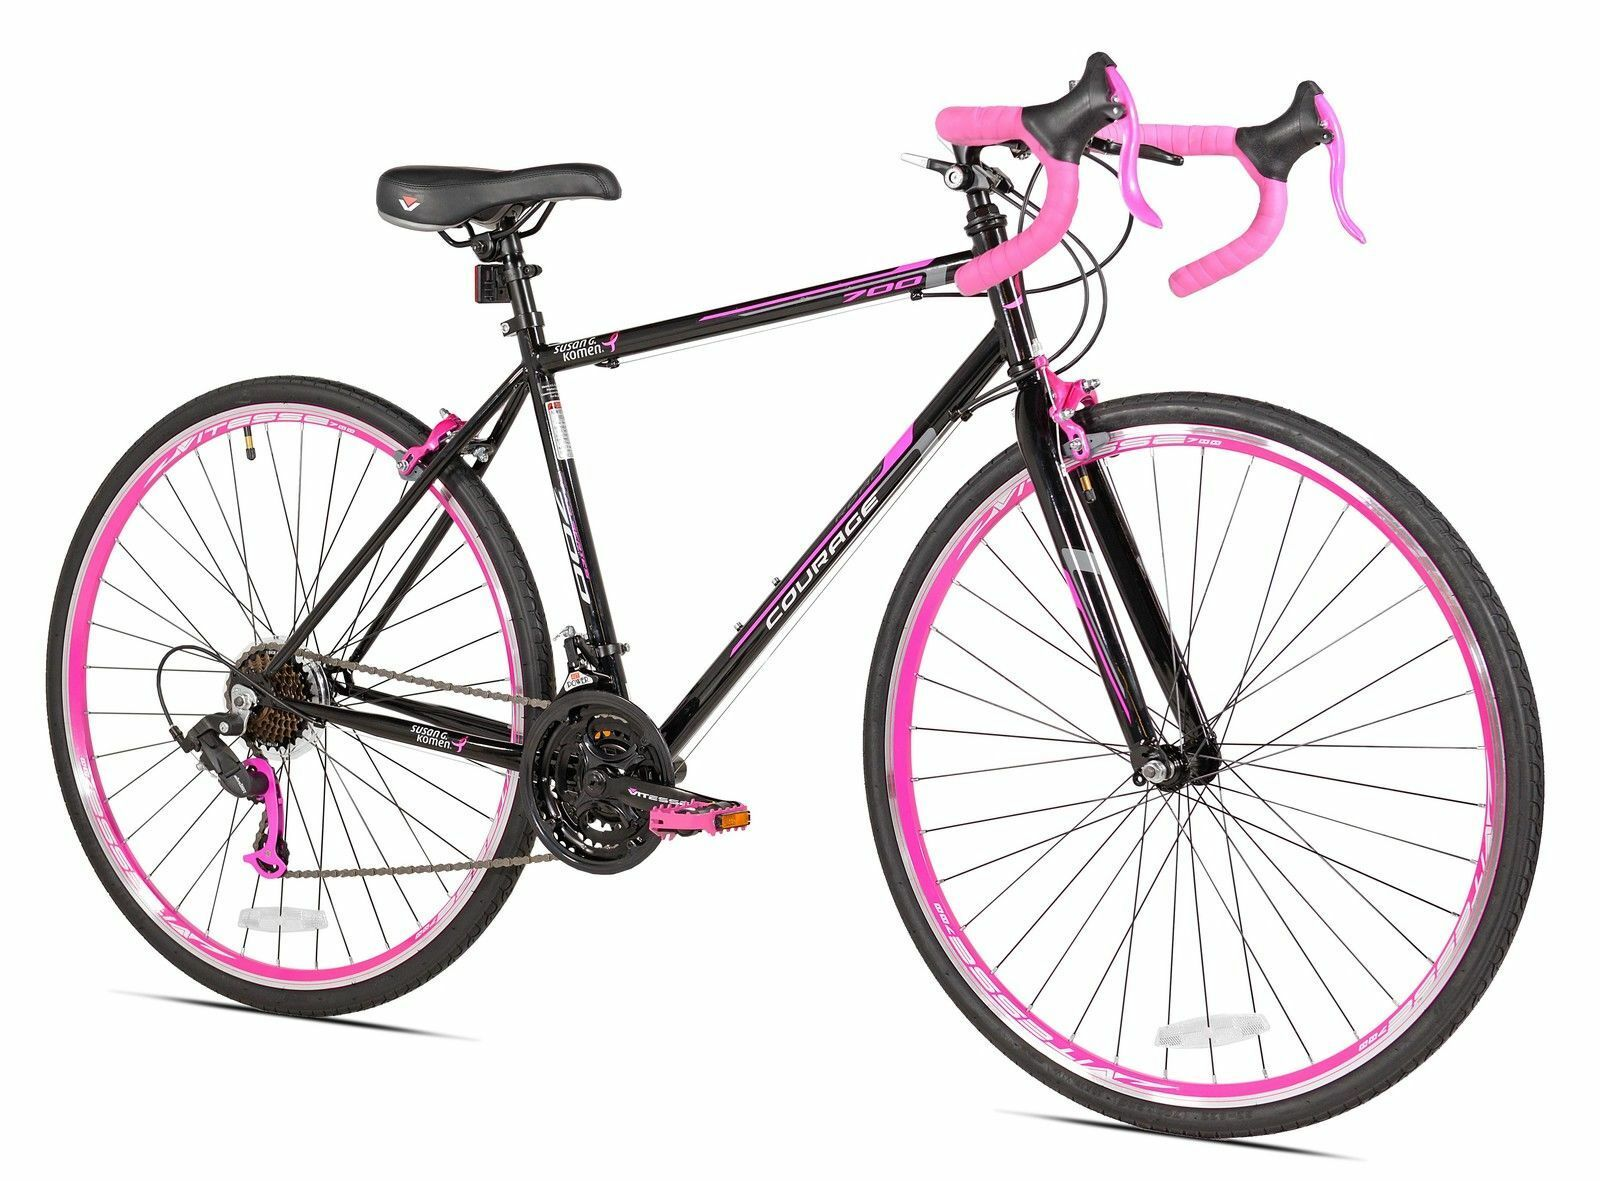 700c Susan G. Komen Courage Women's Road Bike